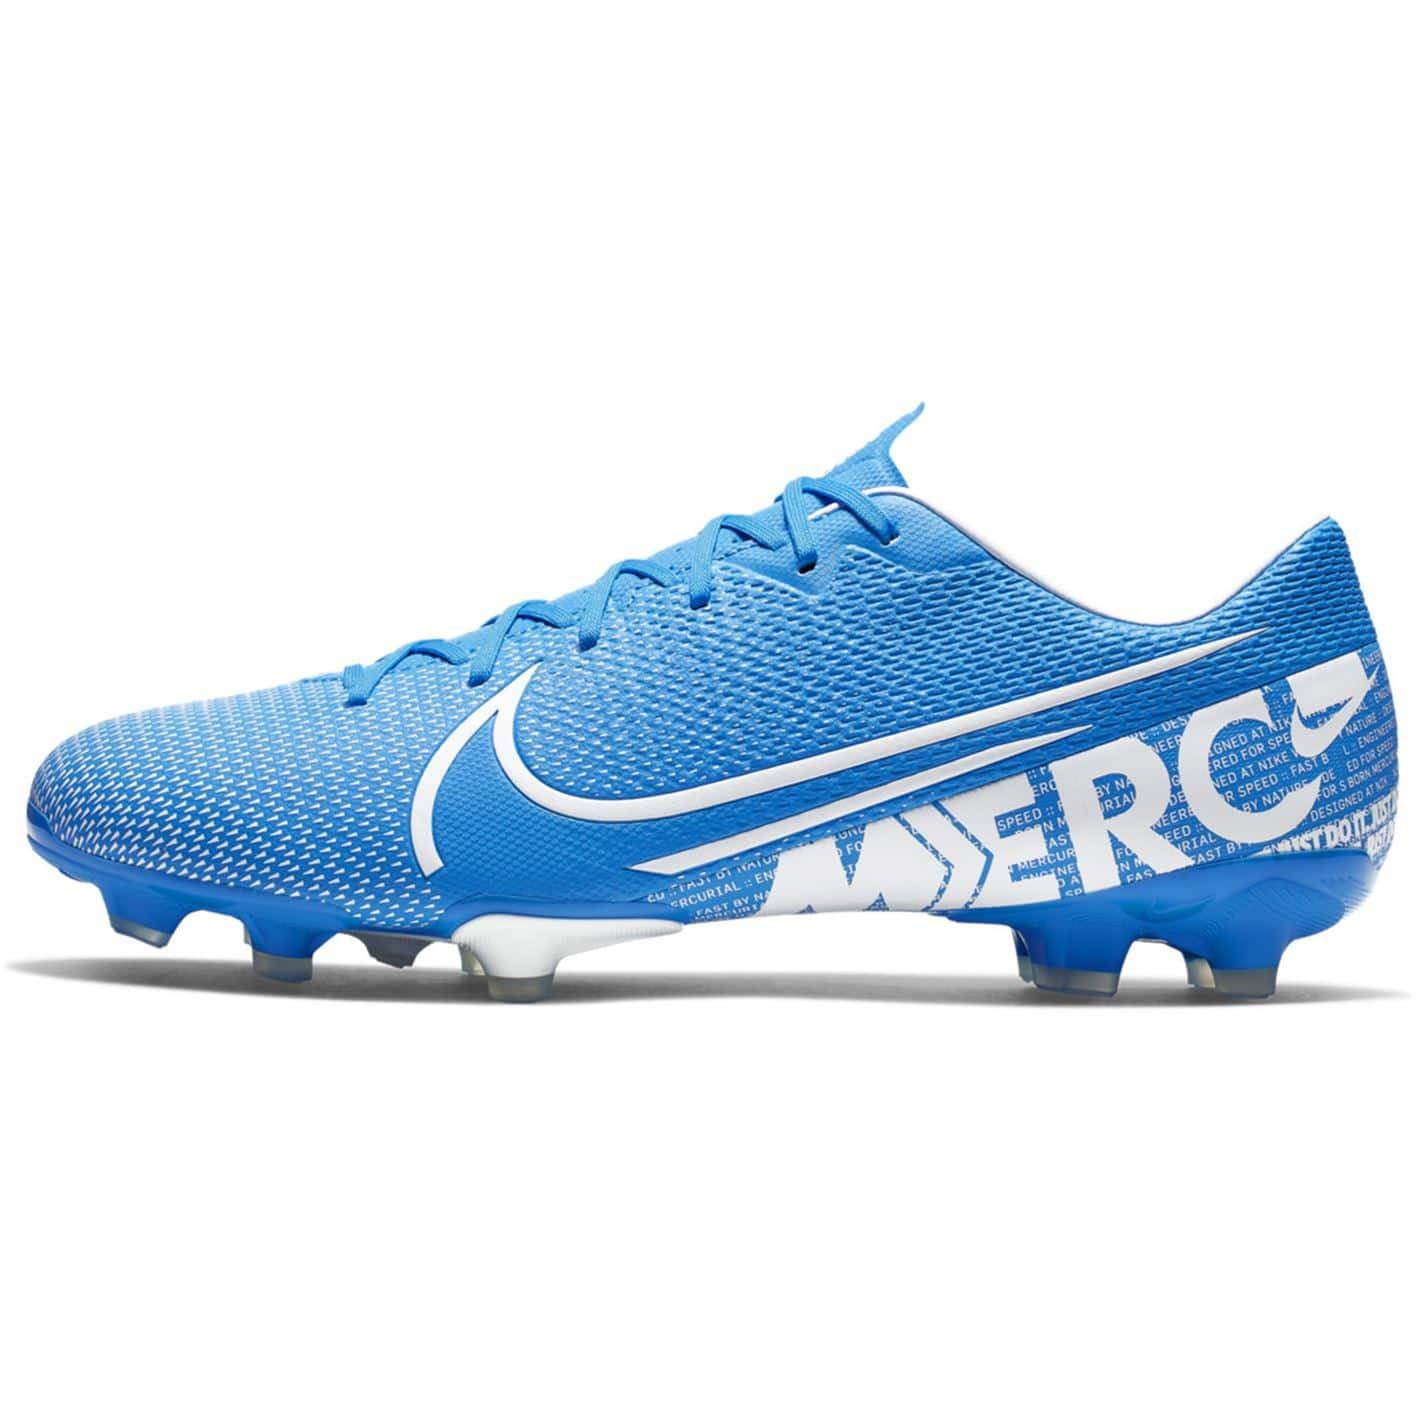 Nike Mercurial Vapor Academy Mens FG Football Boots